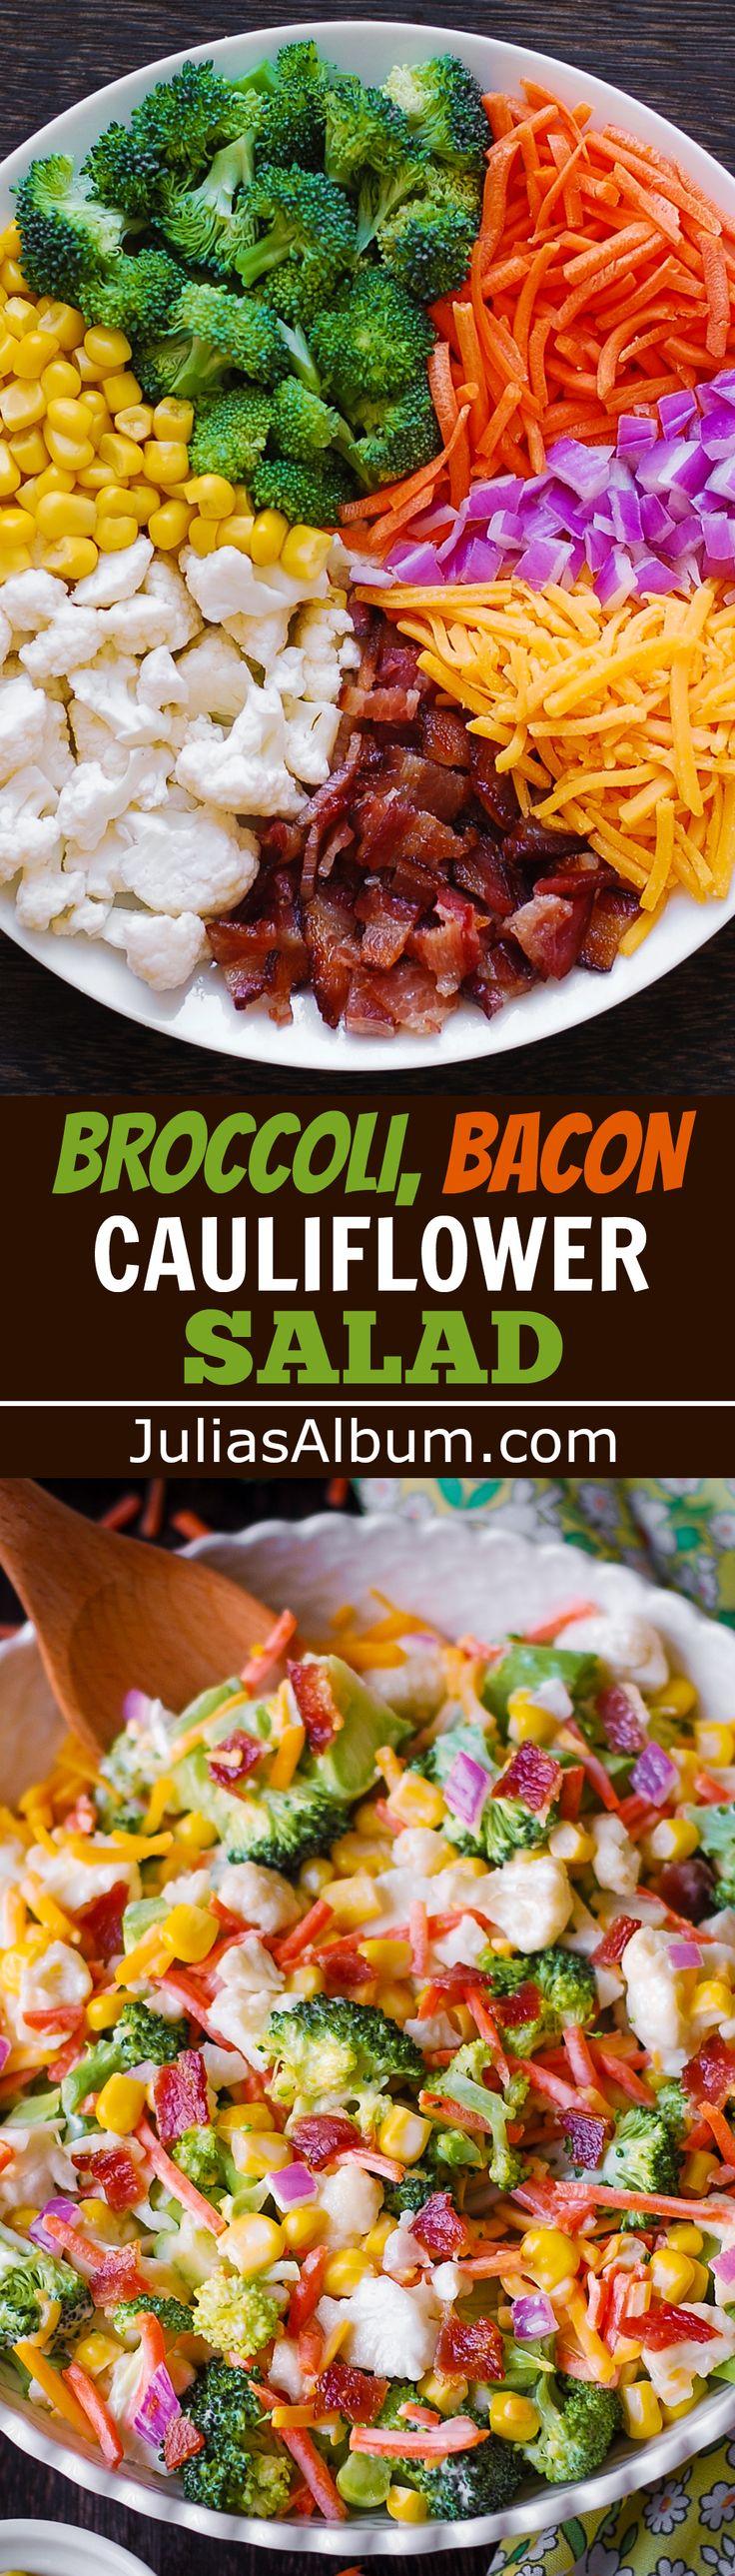 Creamy Broccoli, Cauliflower, Corn, Bacon Salad with Sliced Carrots, Diced Red Onions, and shredded Sharp Cheddar Cheese. #sidedish #holidays